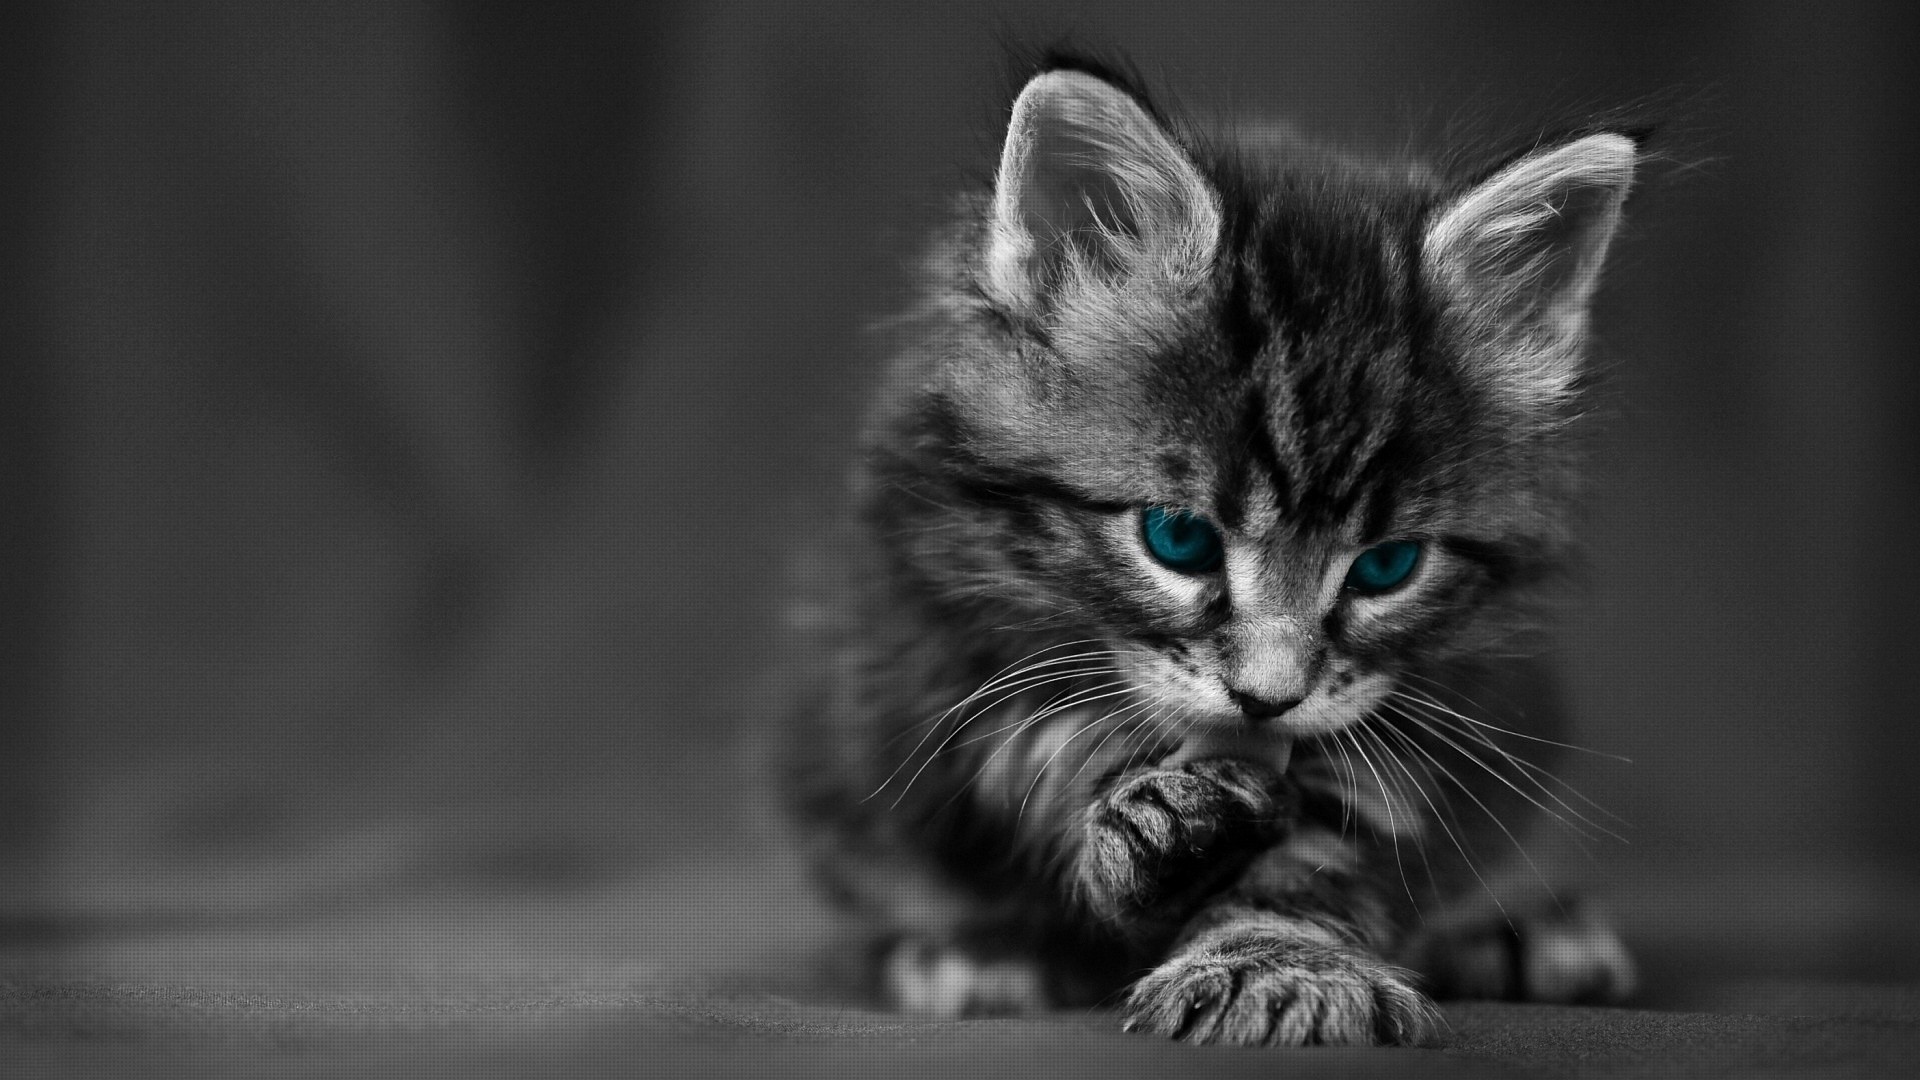 cat hd desktop wallpaperhtmlcute black cat hd desktop wallpaper 1920x1080